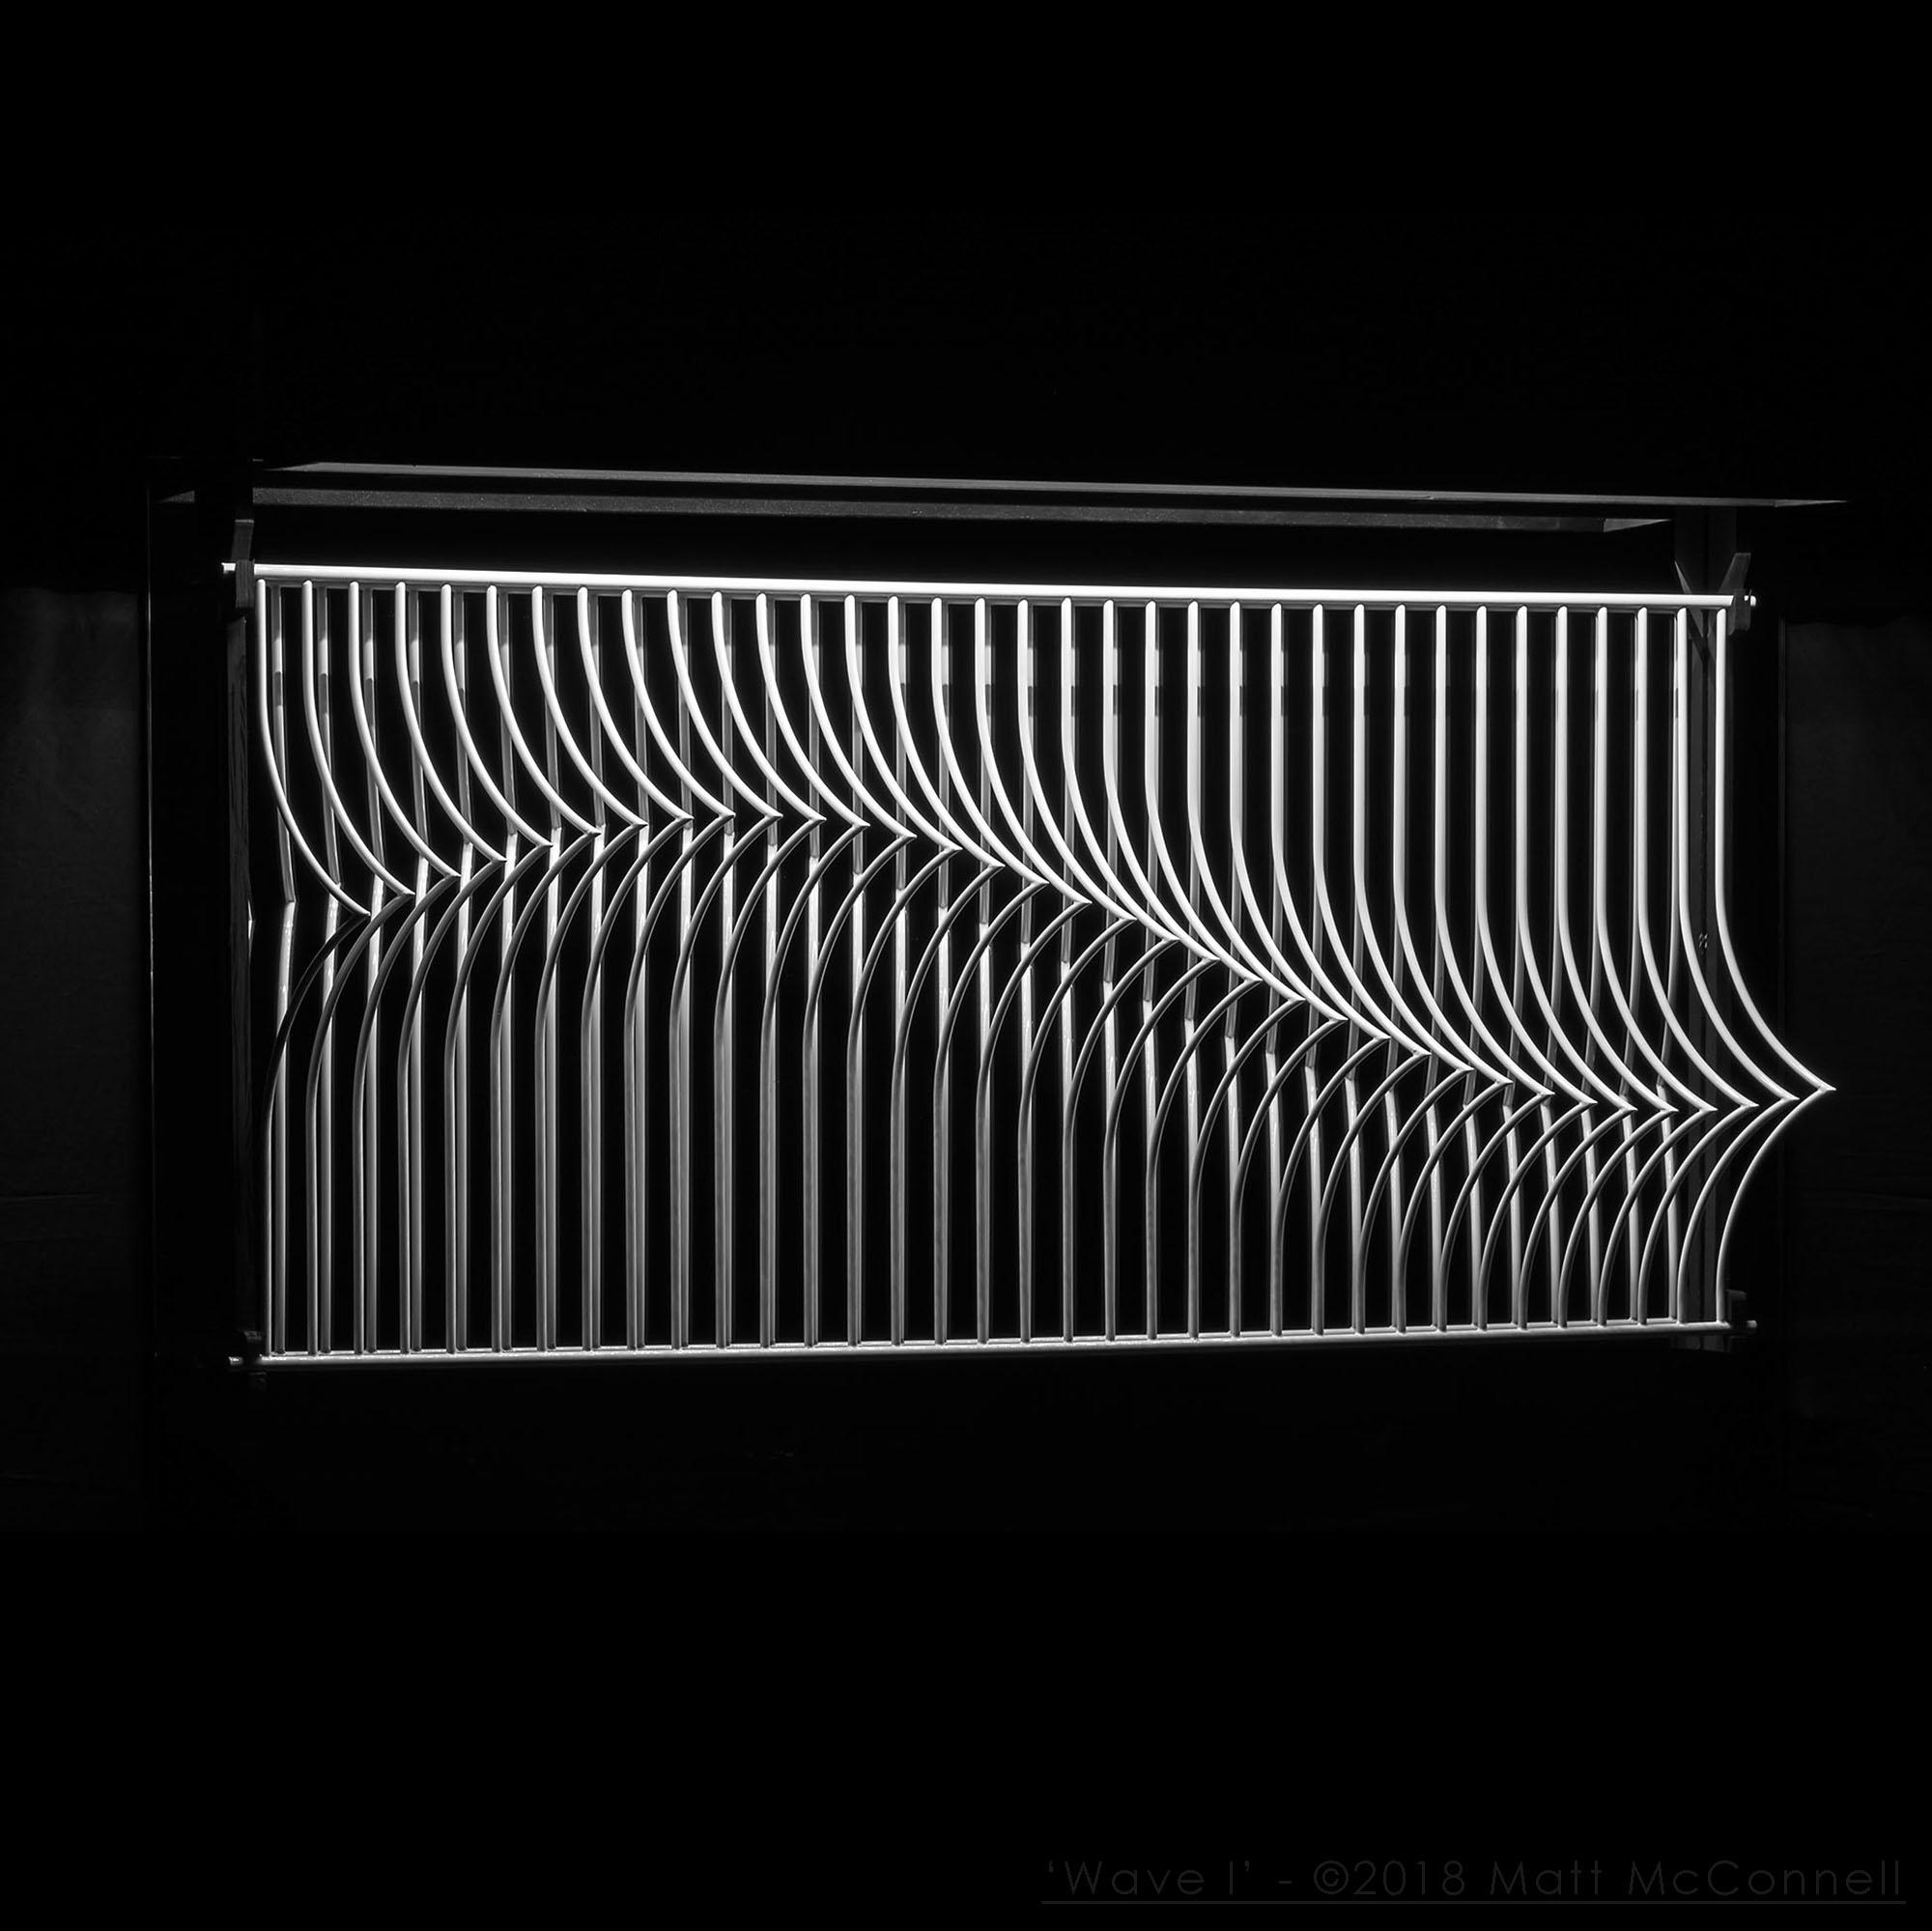 'Wave I-©2018 Matt McConnell - 04.jpg